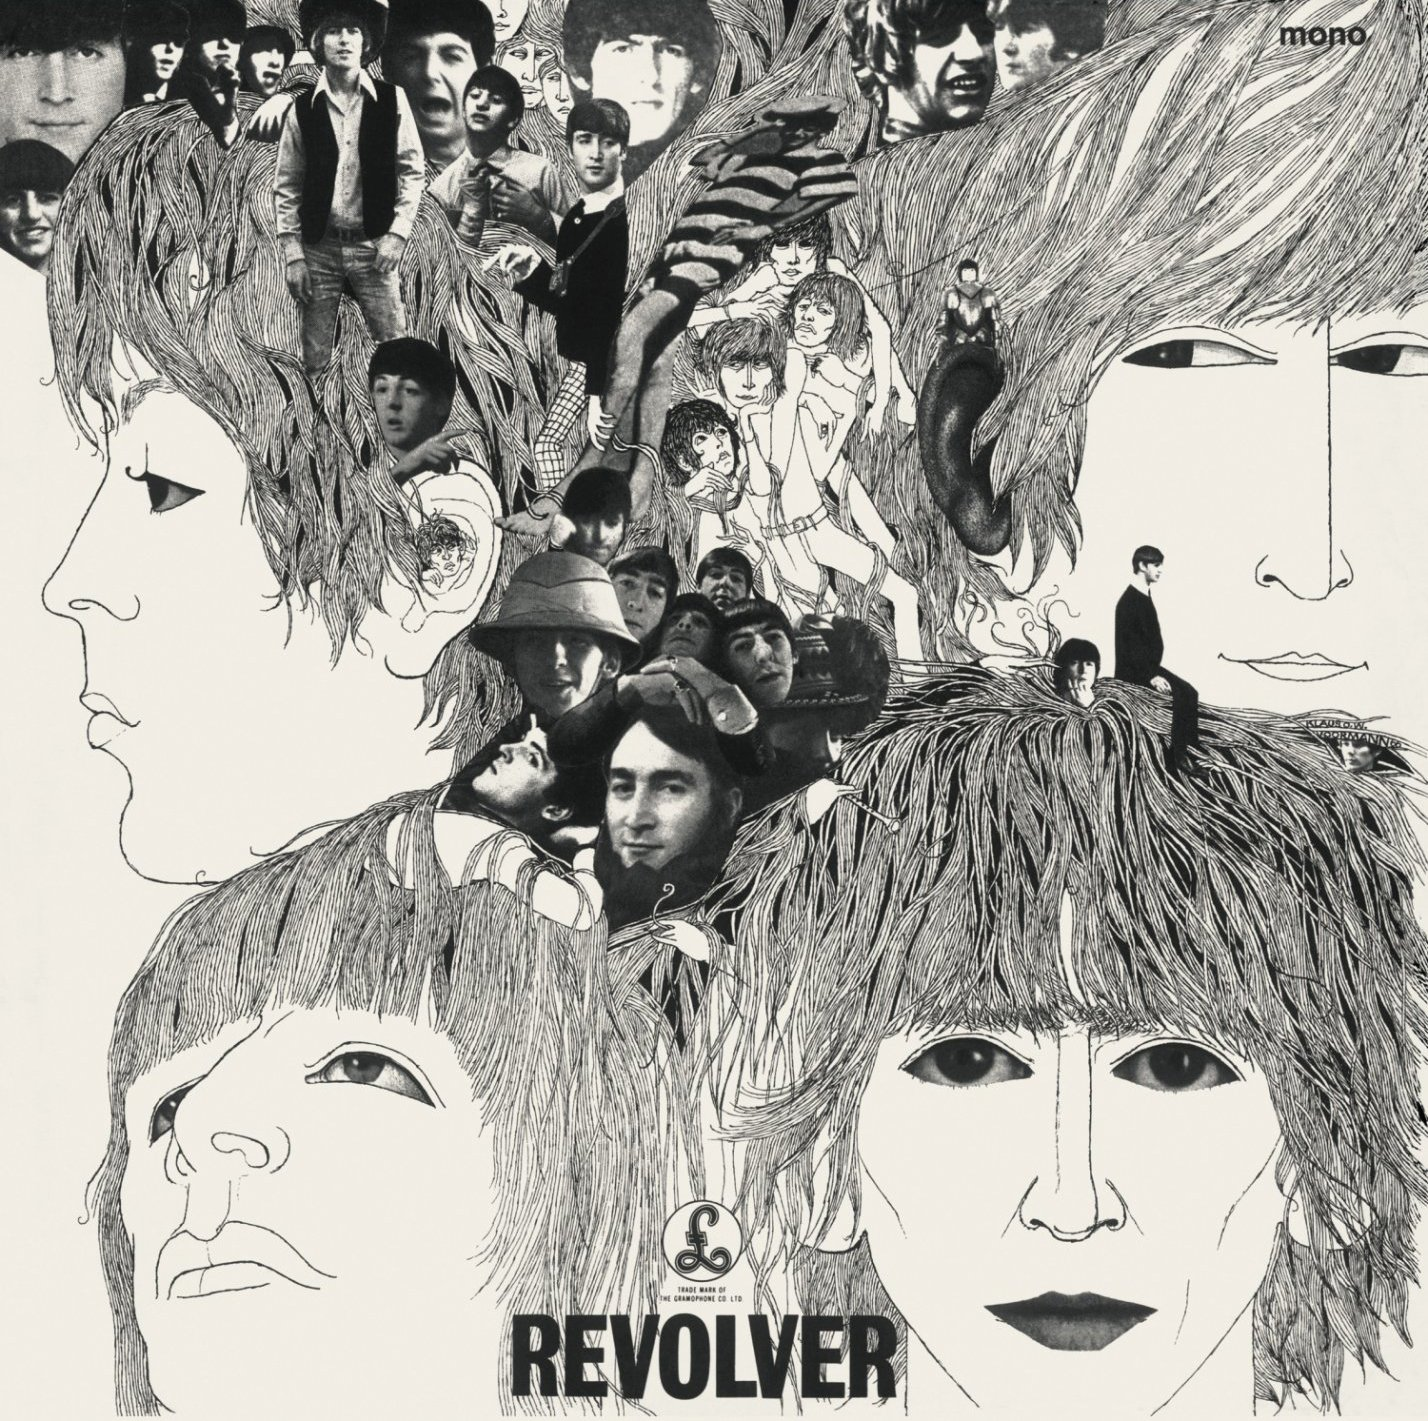 Revolver [Mono LP] by VINYL